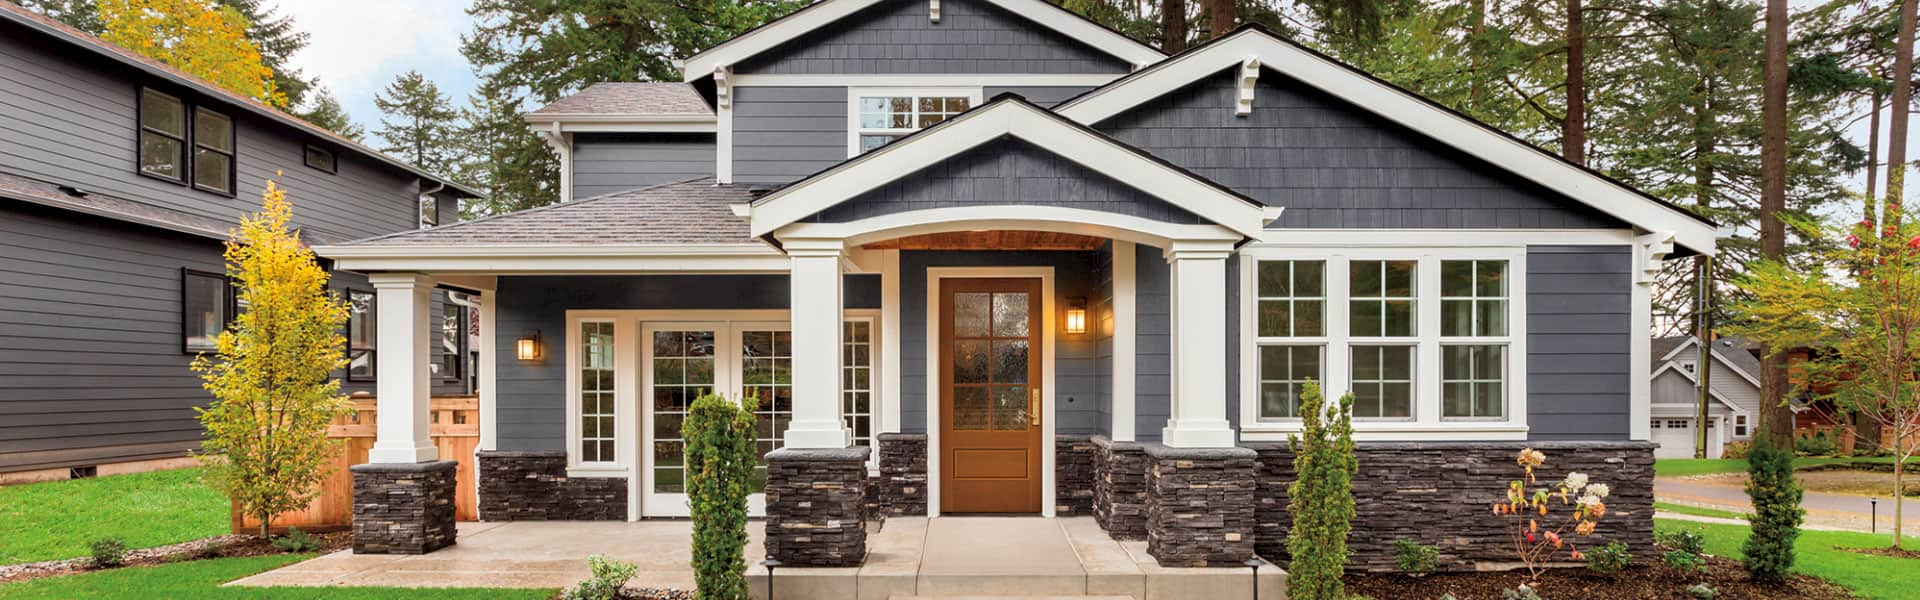 traditional home exterior with a new fiberglass half-light entry door